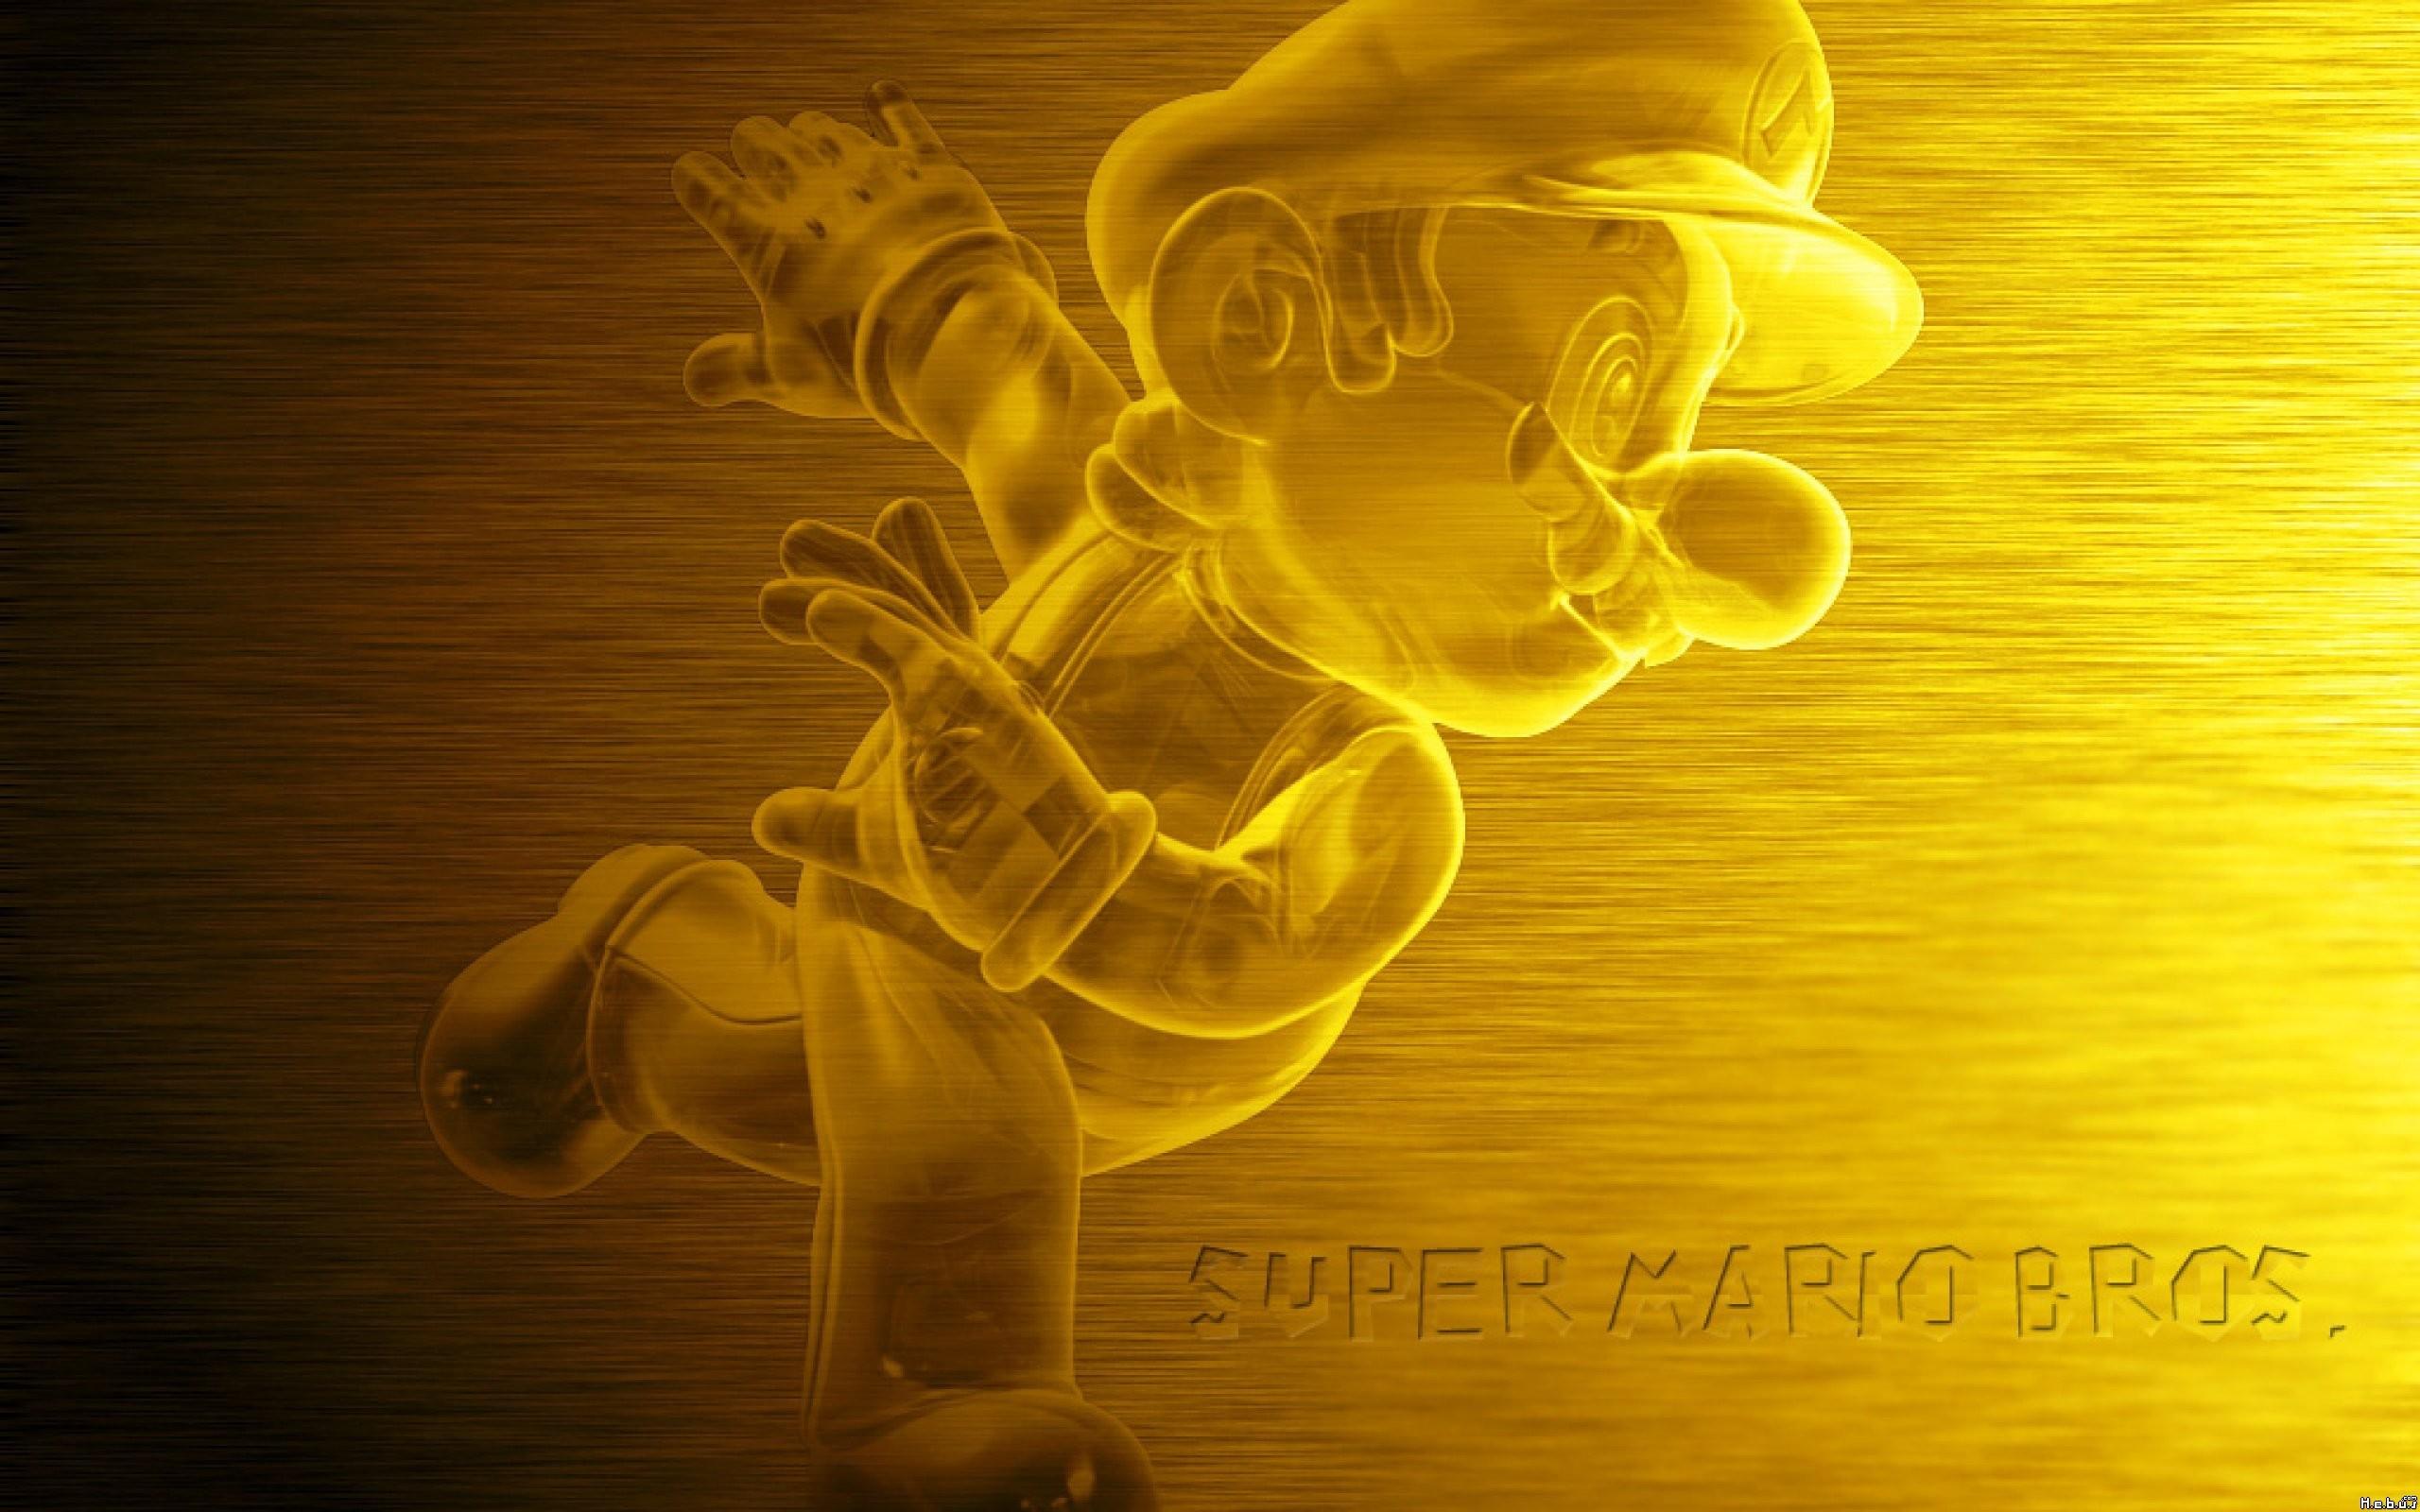 VCI.2228 Super Mario Bros Photos – HD5 Wallpapers